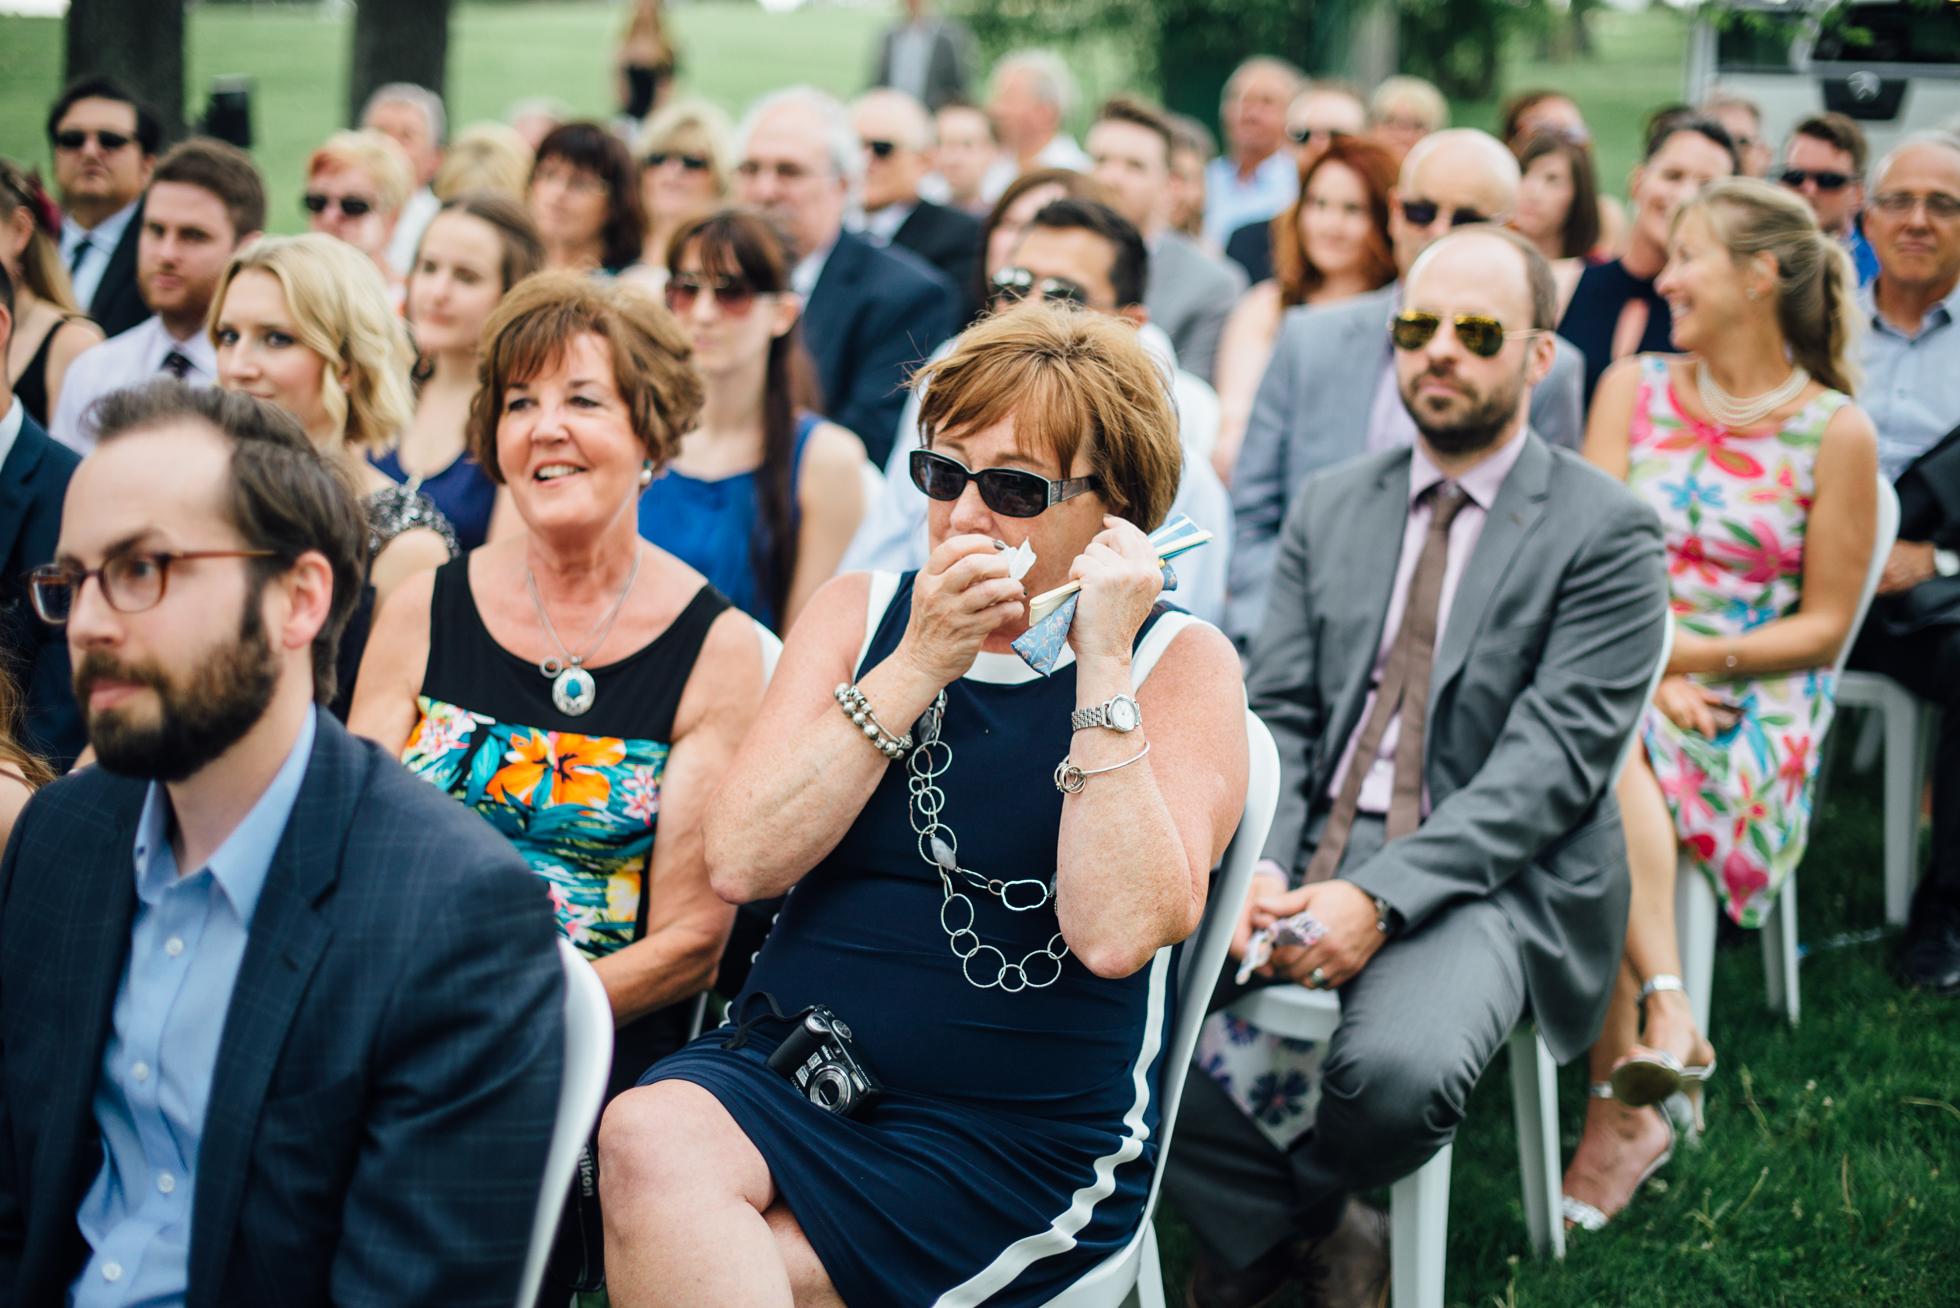 Outdoor-Caledon-Tralee-Wedding-Photography-61